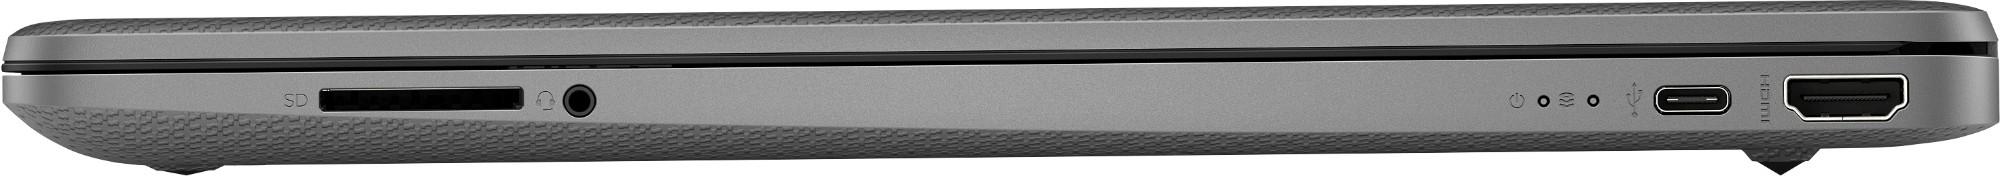 HP 15s-fq0005nh